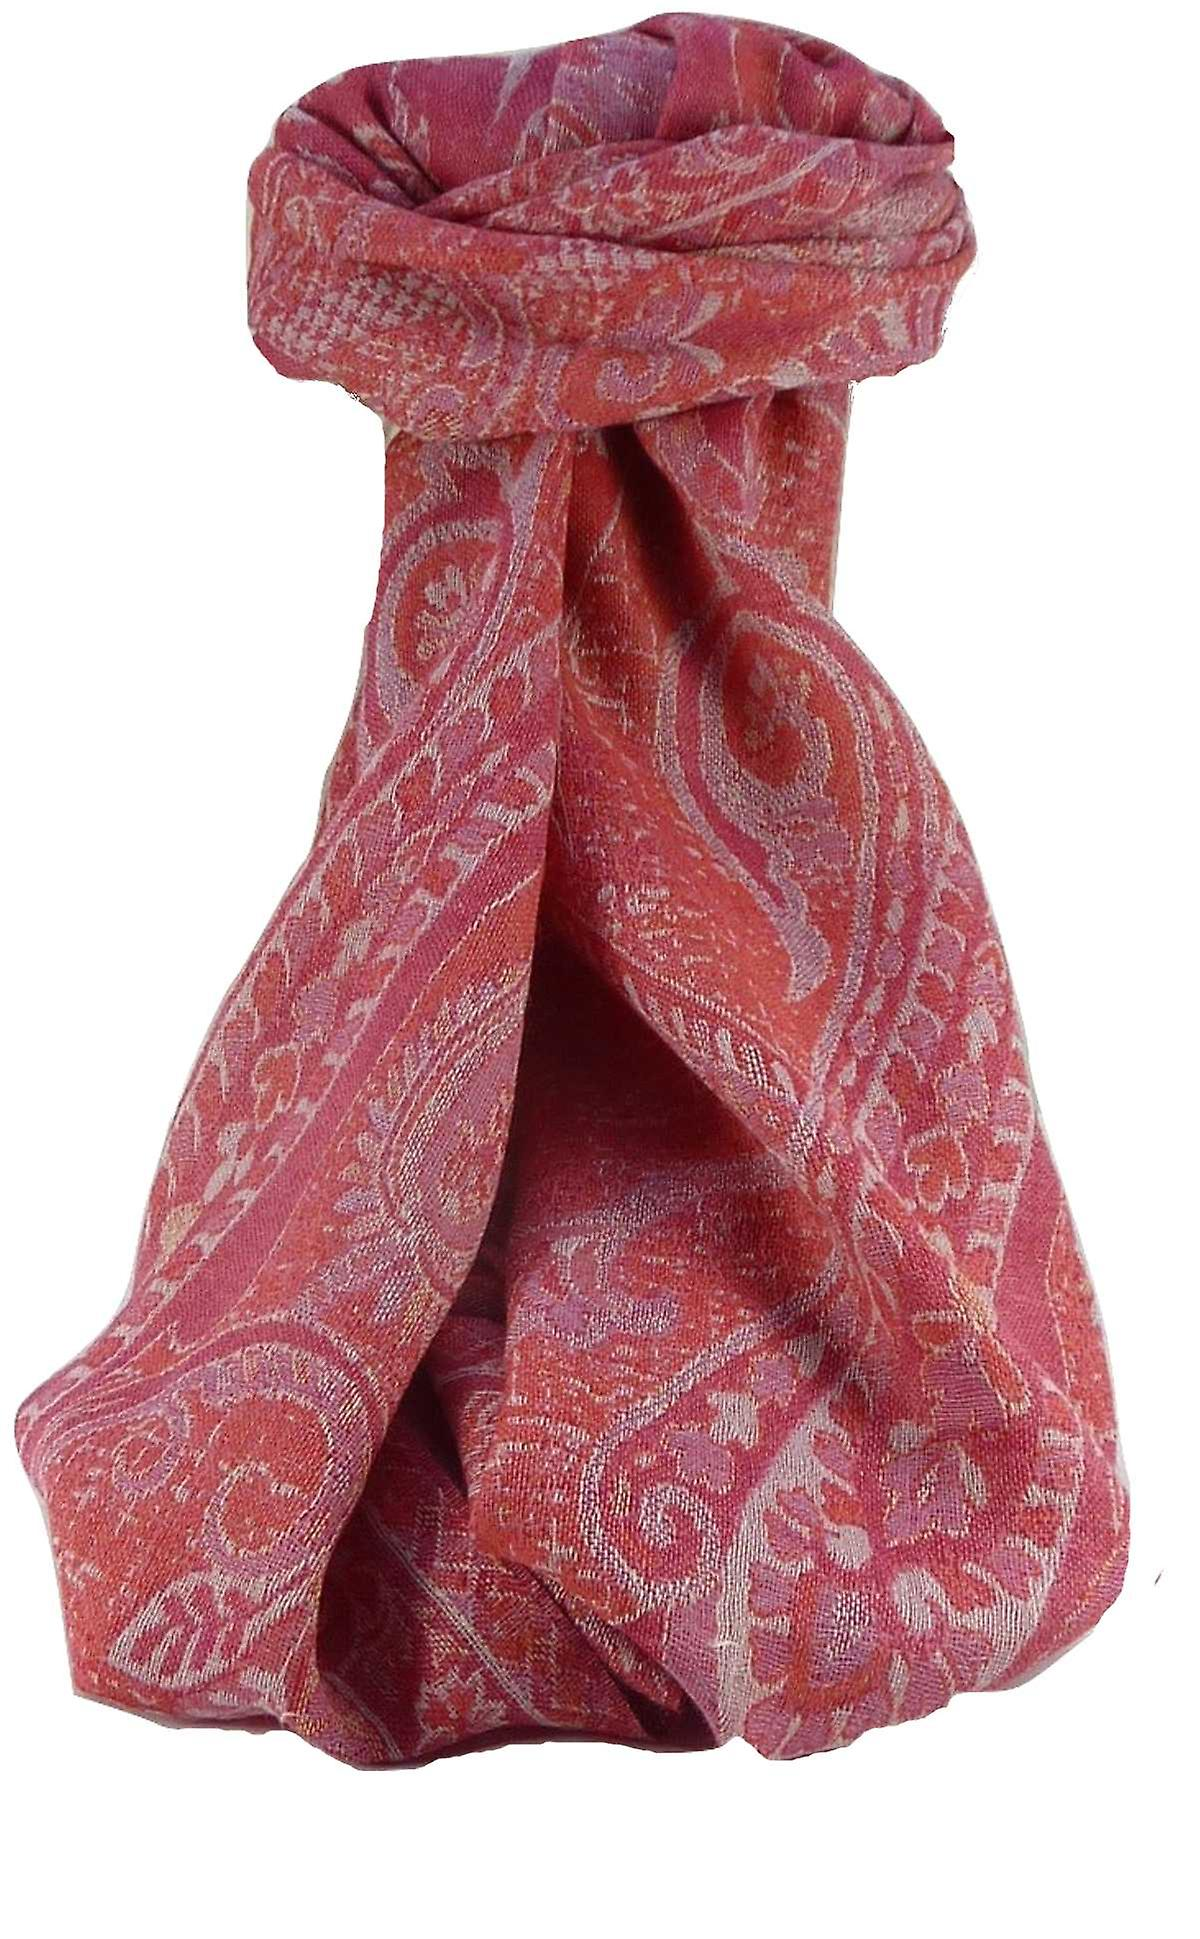 Mens Muffler Scarf 8549 Fine Pashmina Wool by Pashmina & Silk